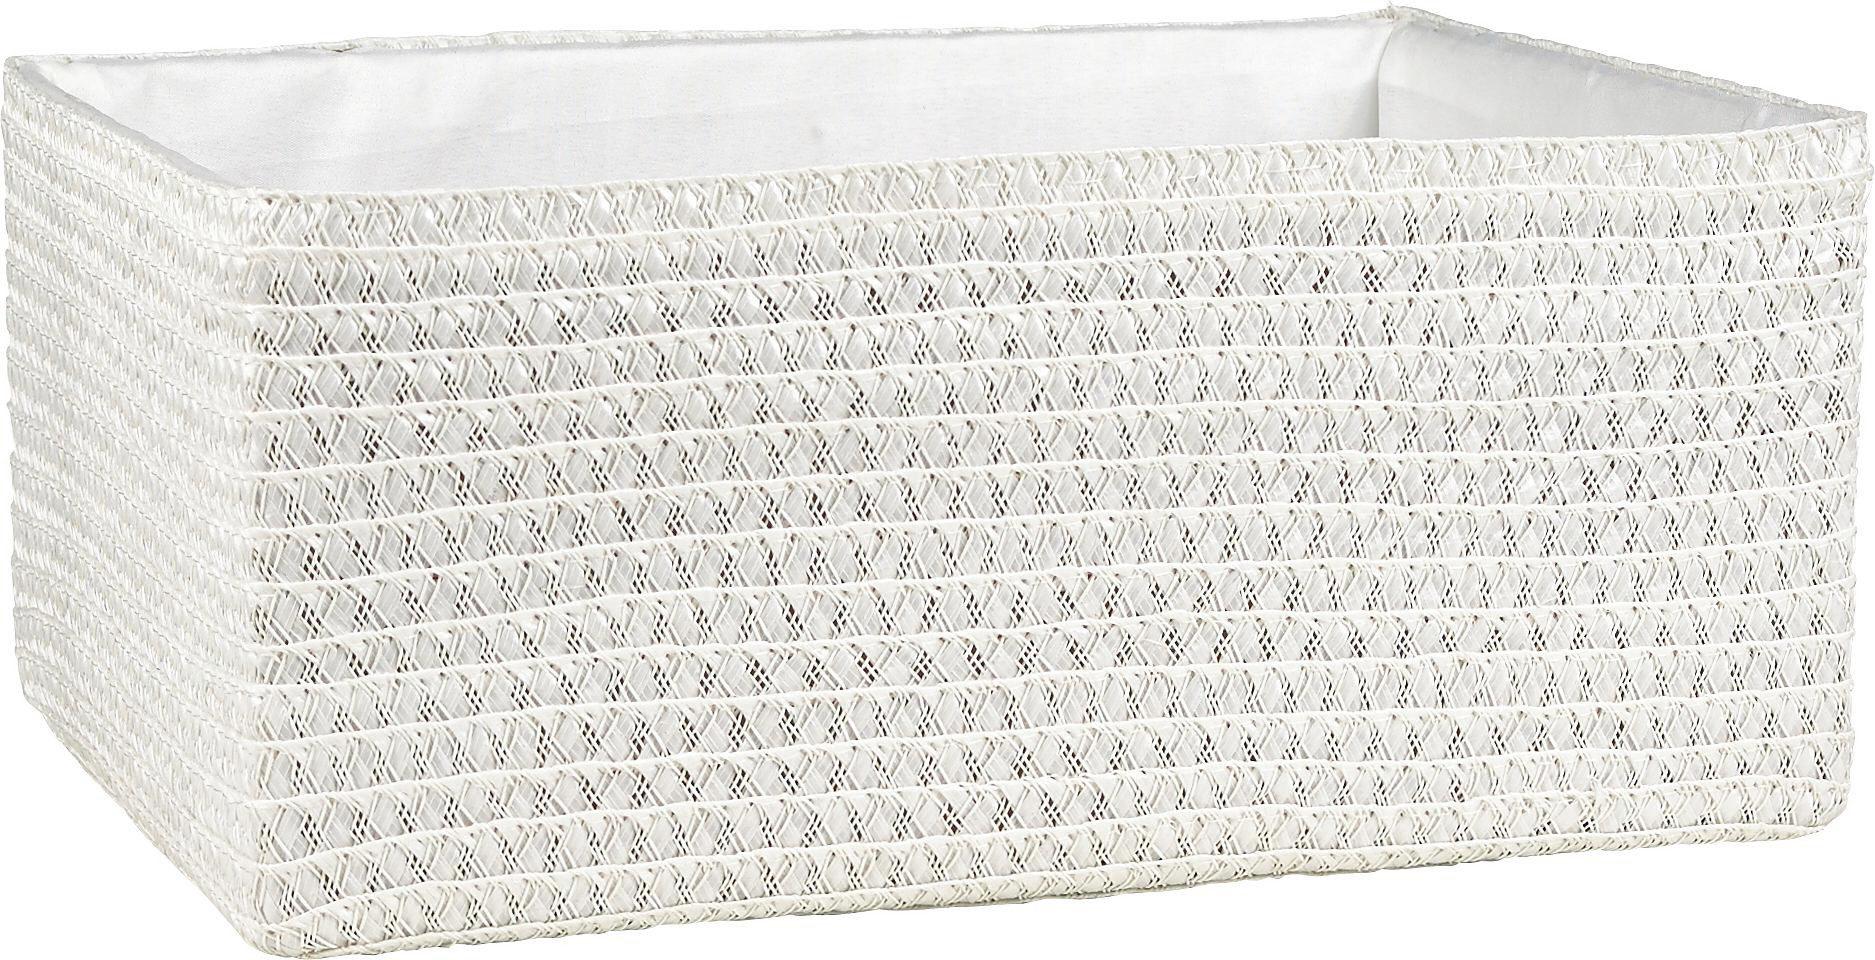 HYLLKORG - vit, Basics, textil/plast (36/26/16cm) - Landscape